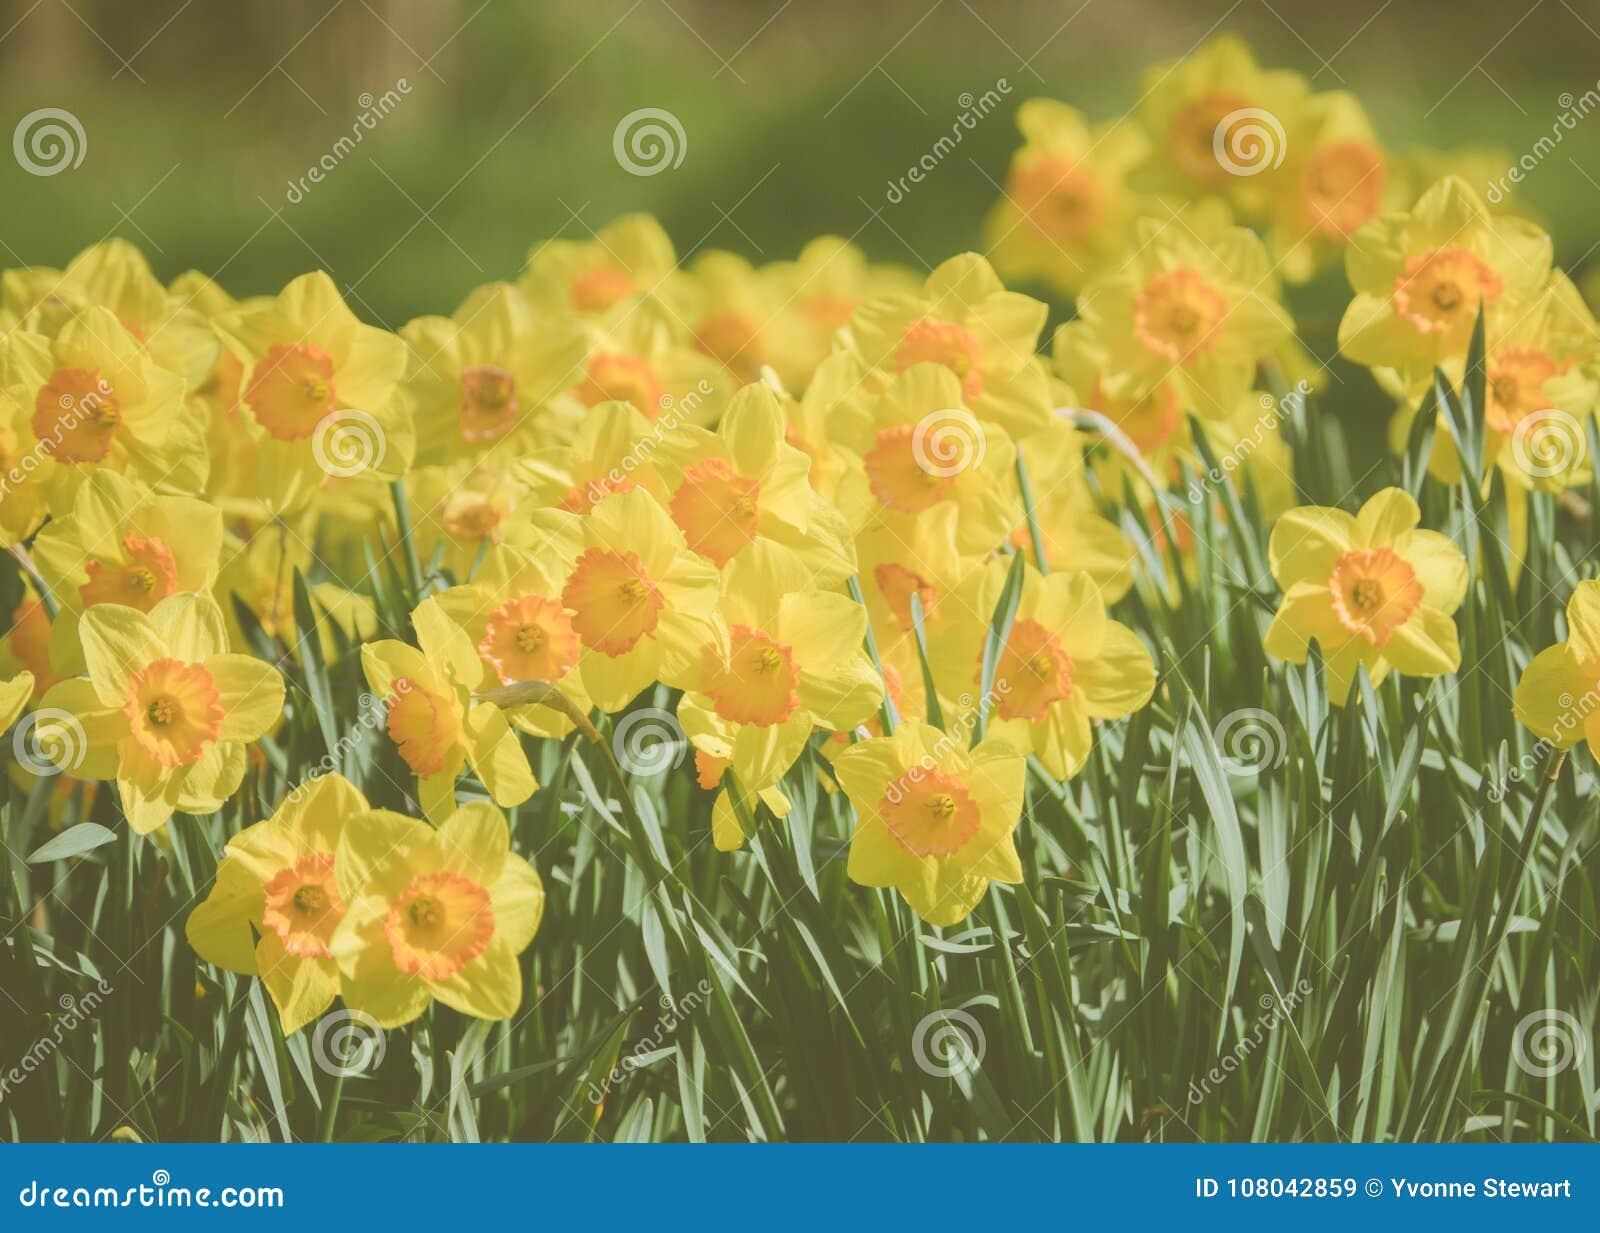 Yellow Spring Daffodils In Scotland Stock Image Image Of Daffodils